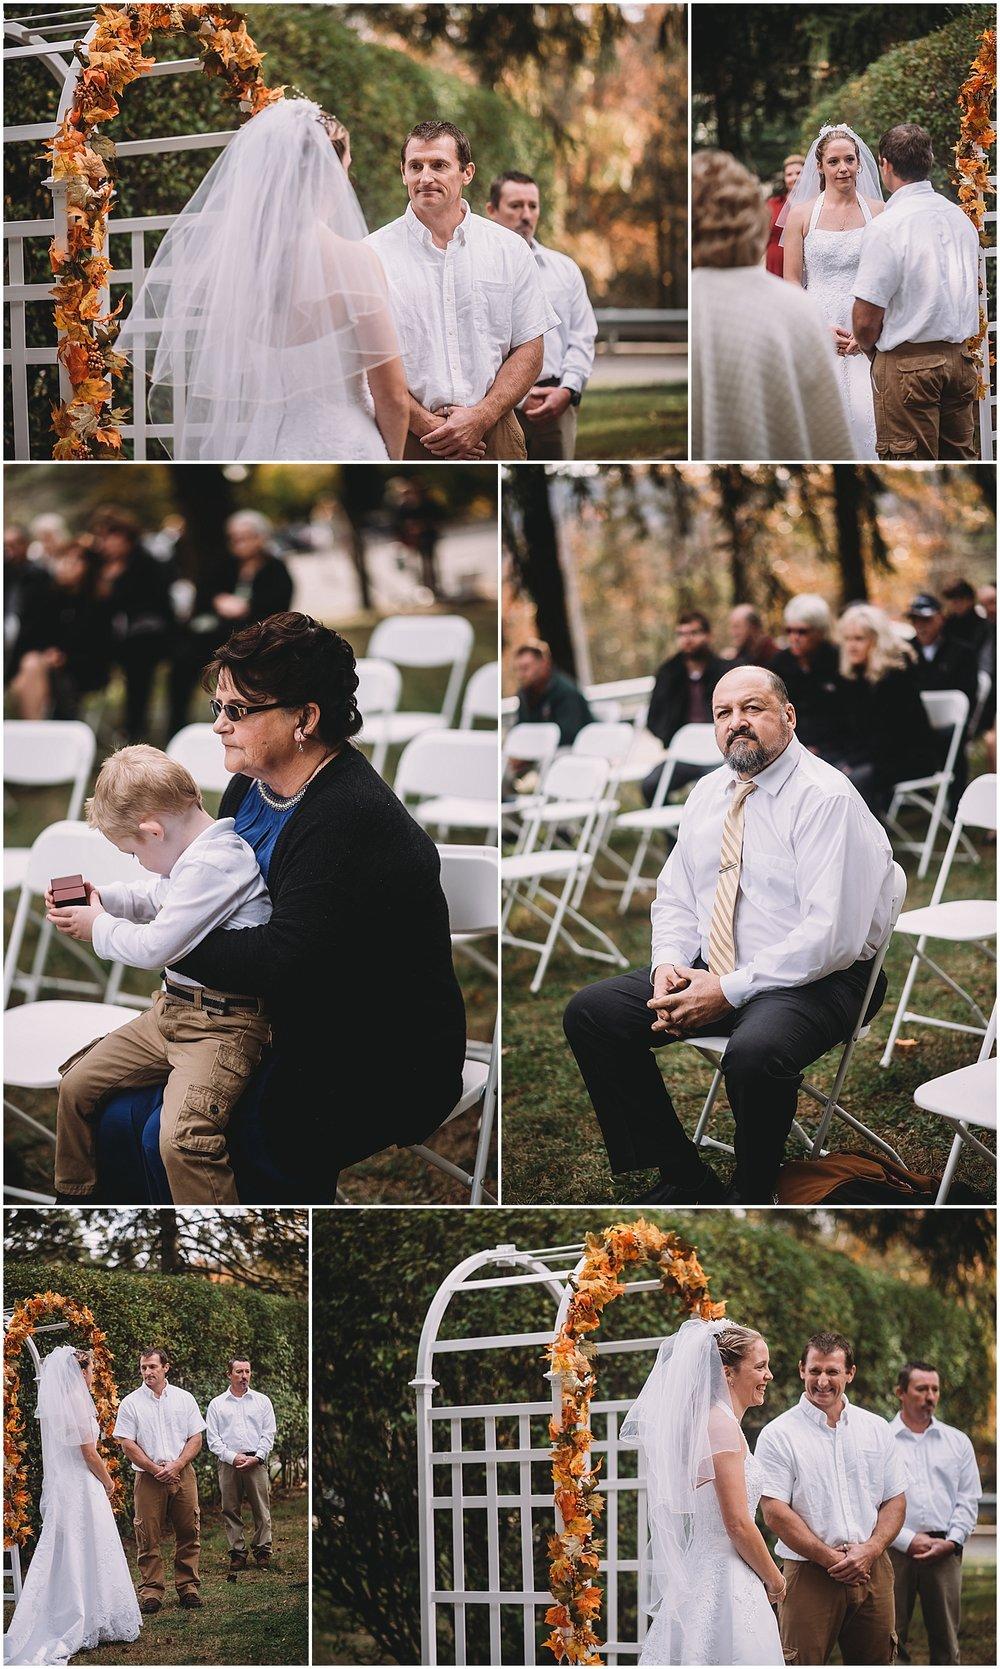 NEPA-Scranton-Dallas-wedding-engagement-photographer-in-Philadelphia-PA-Central-PA_0084.jpg